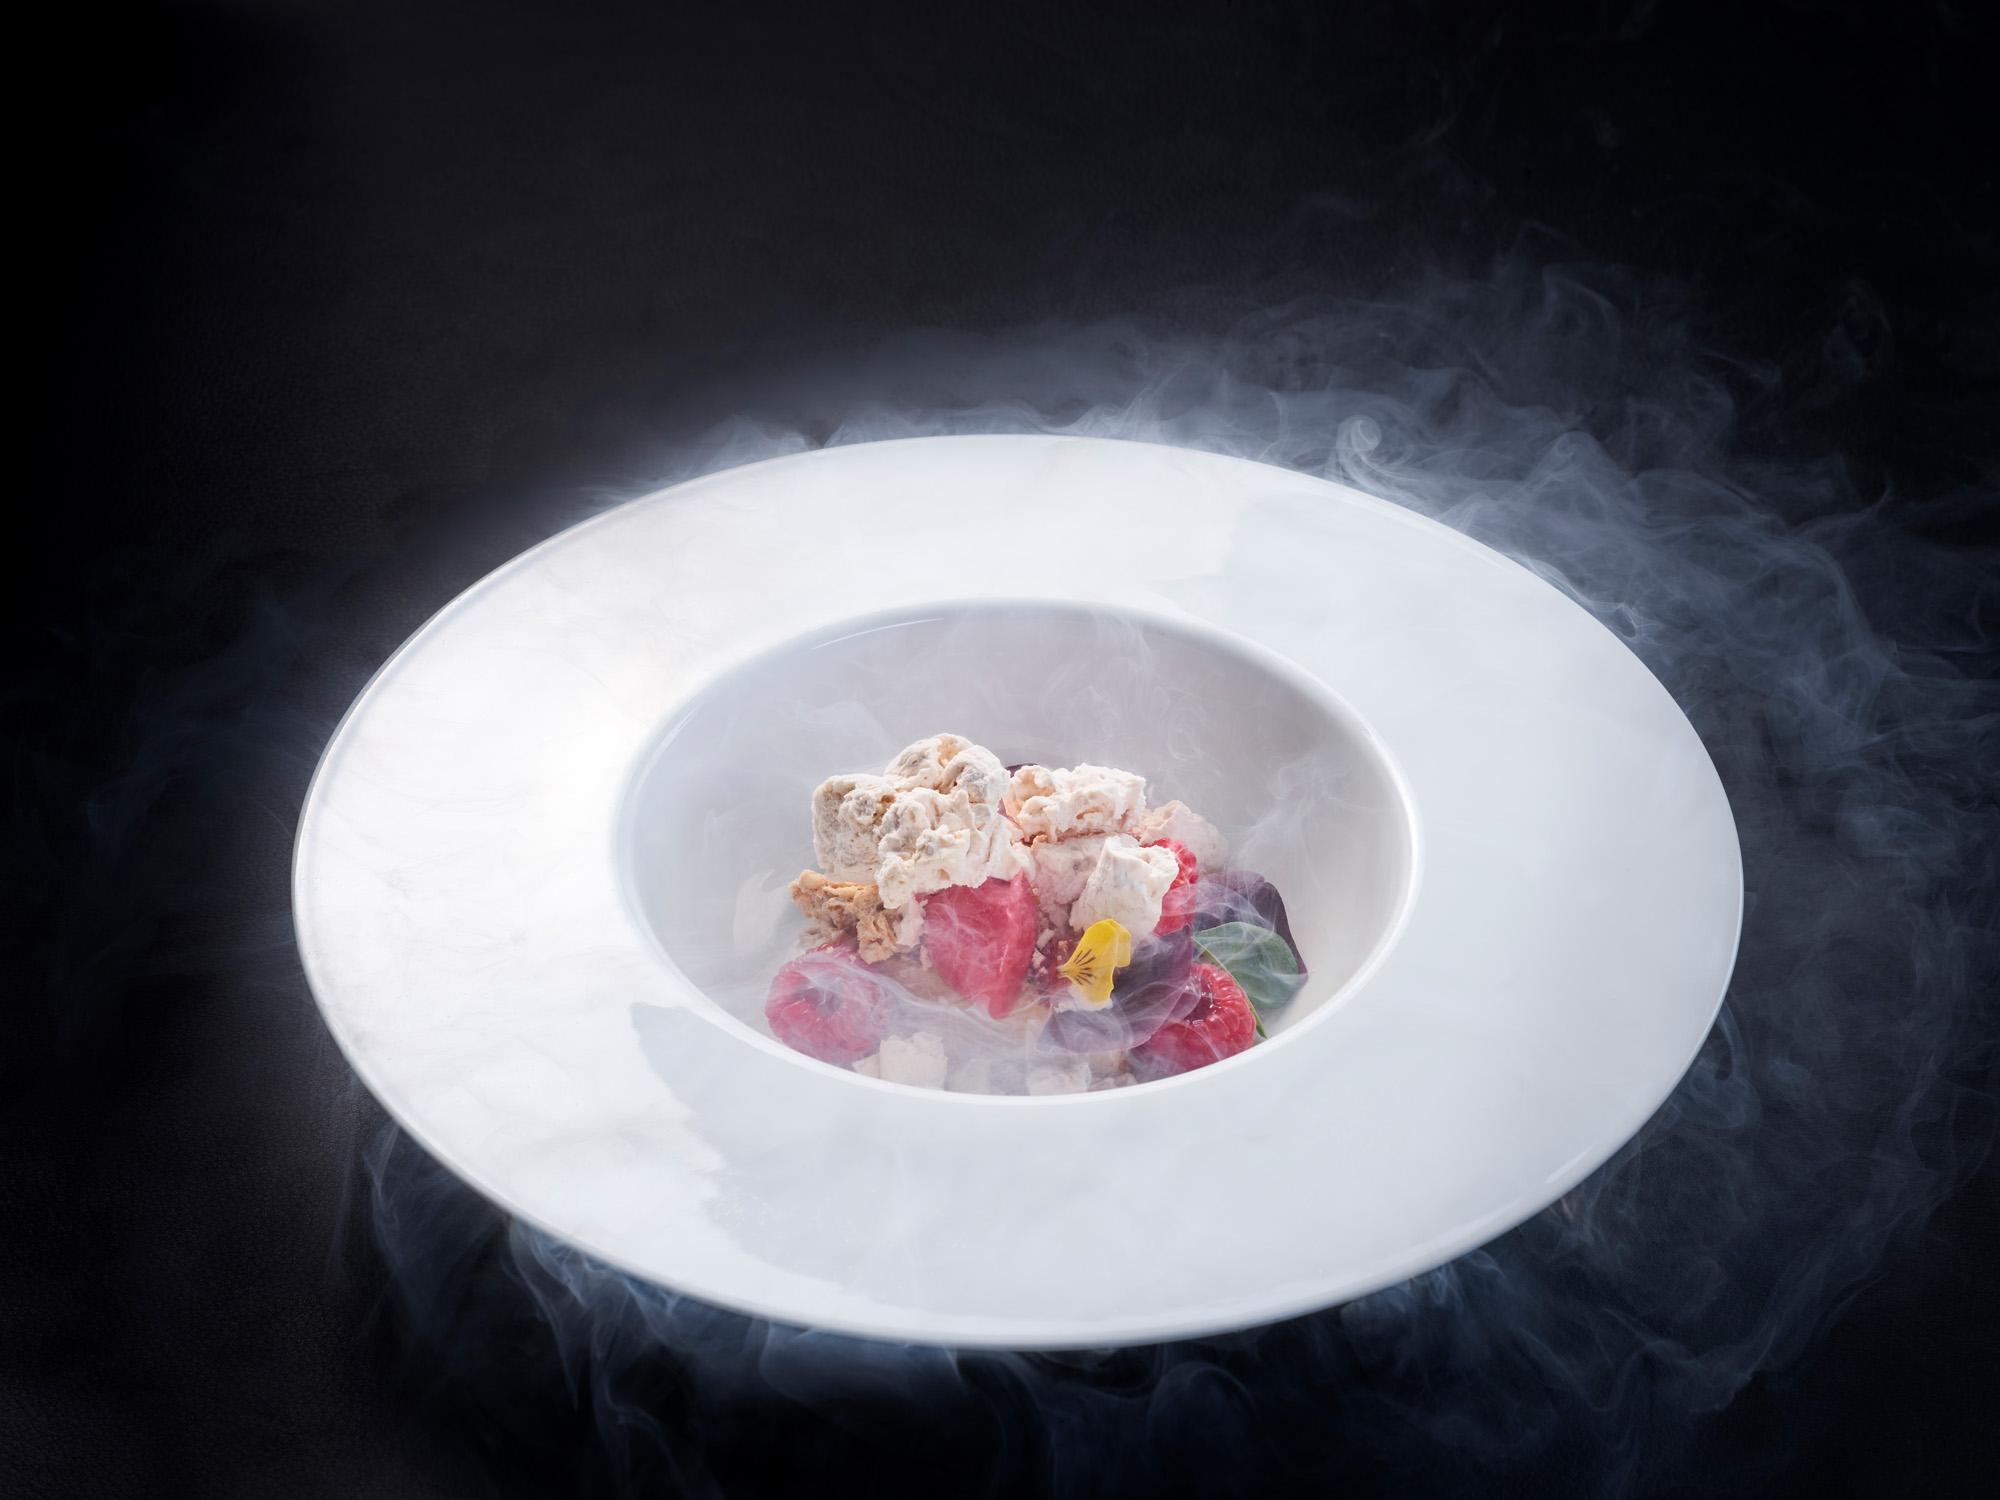 iSi Speisemeisterei 21 9 176270 - iSi Kulinarik: Inspiring Food